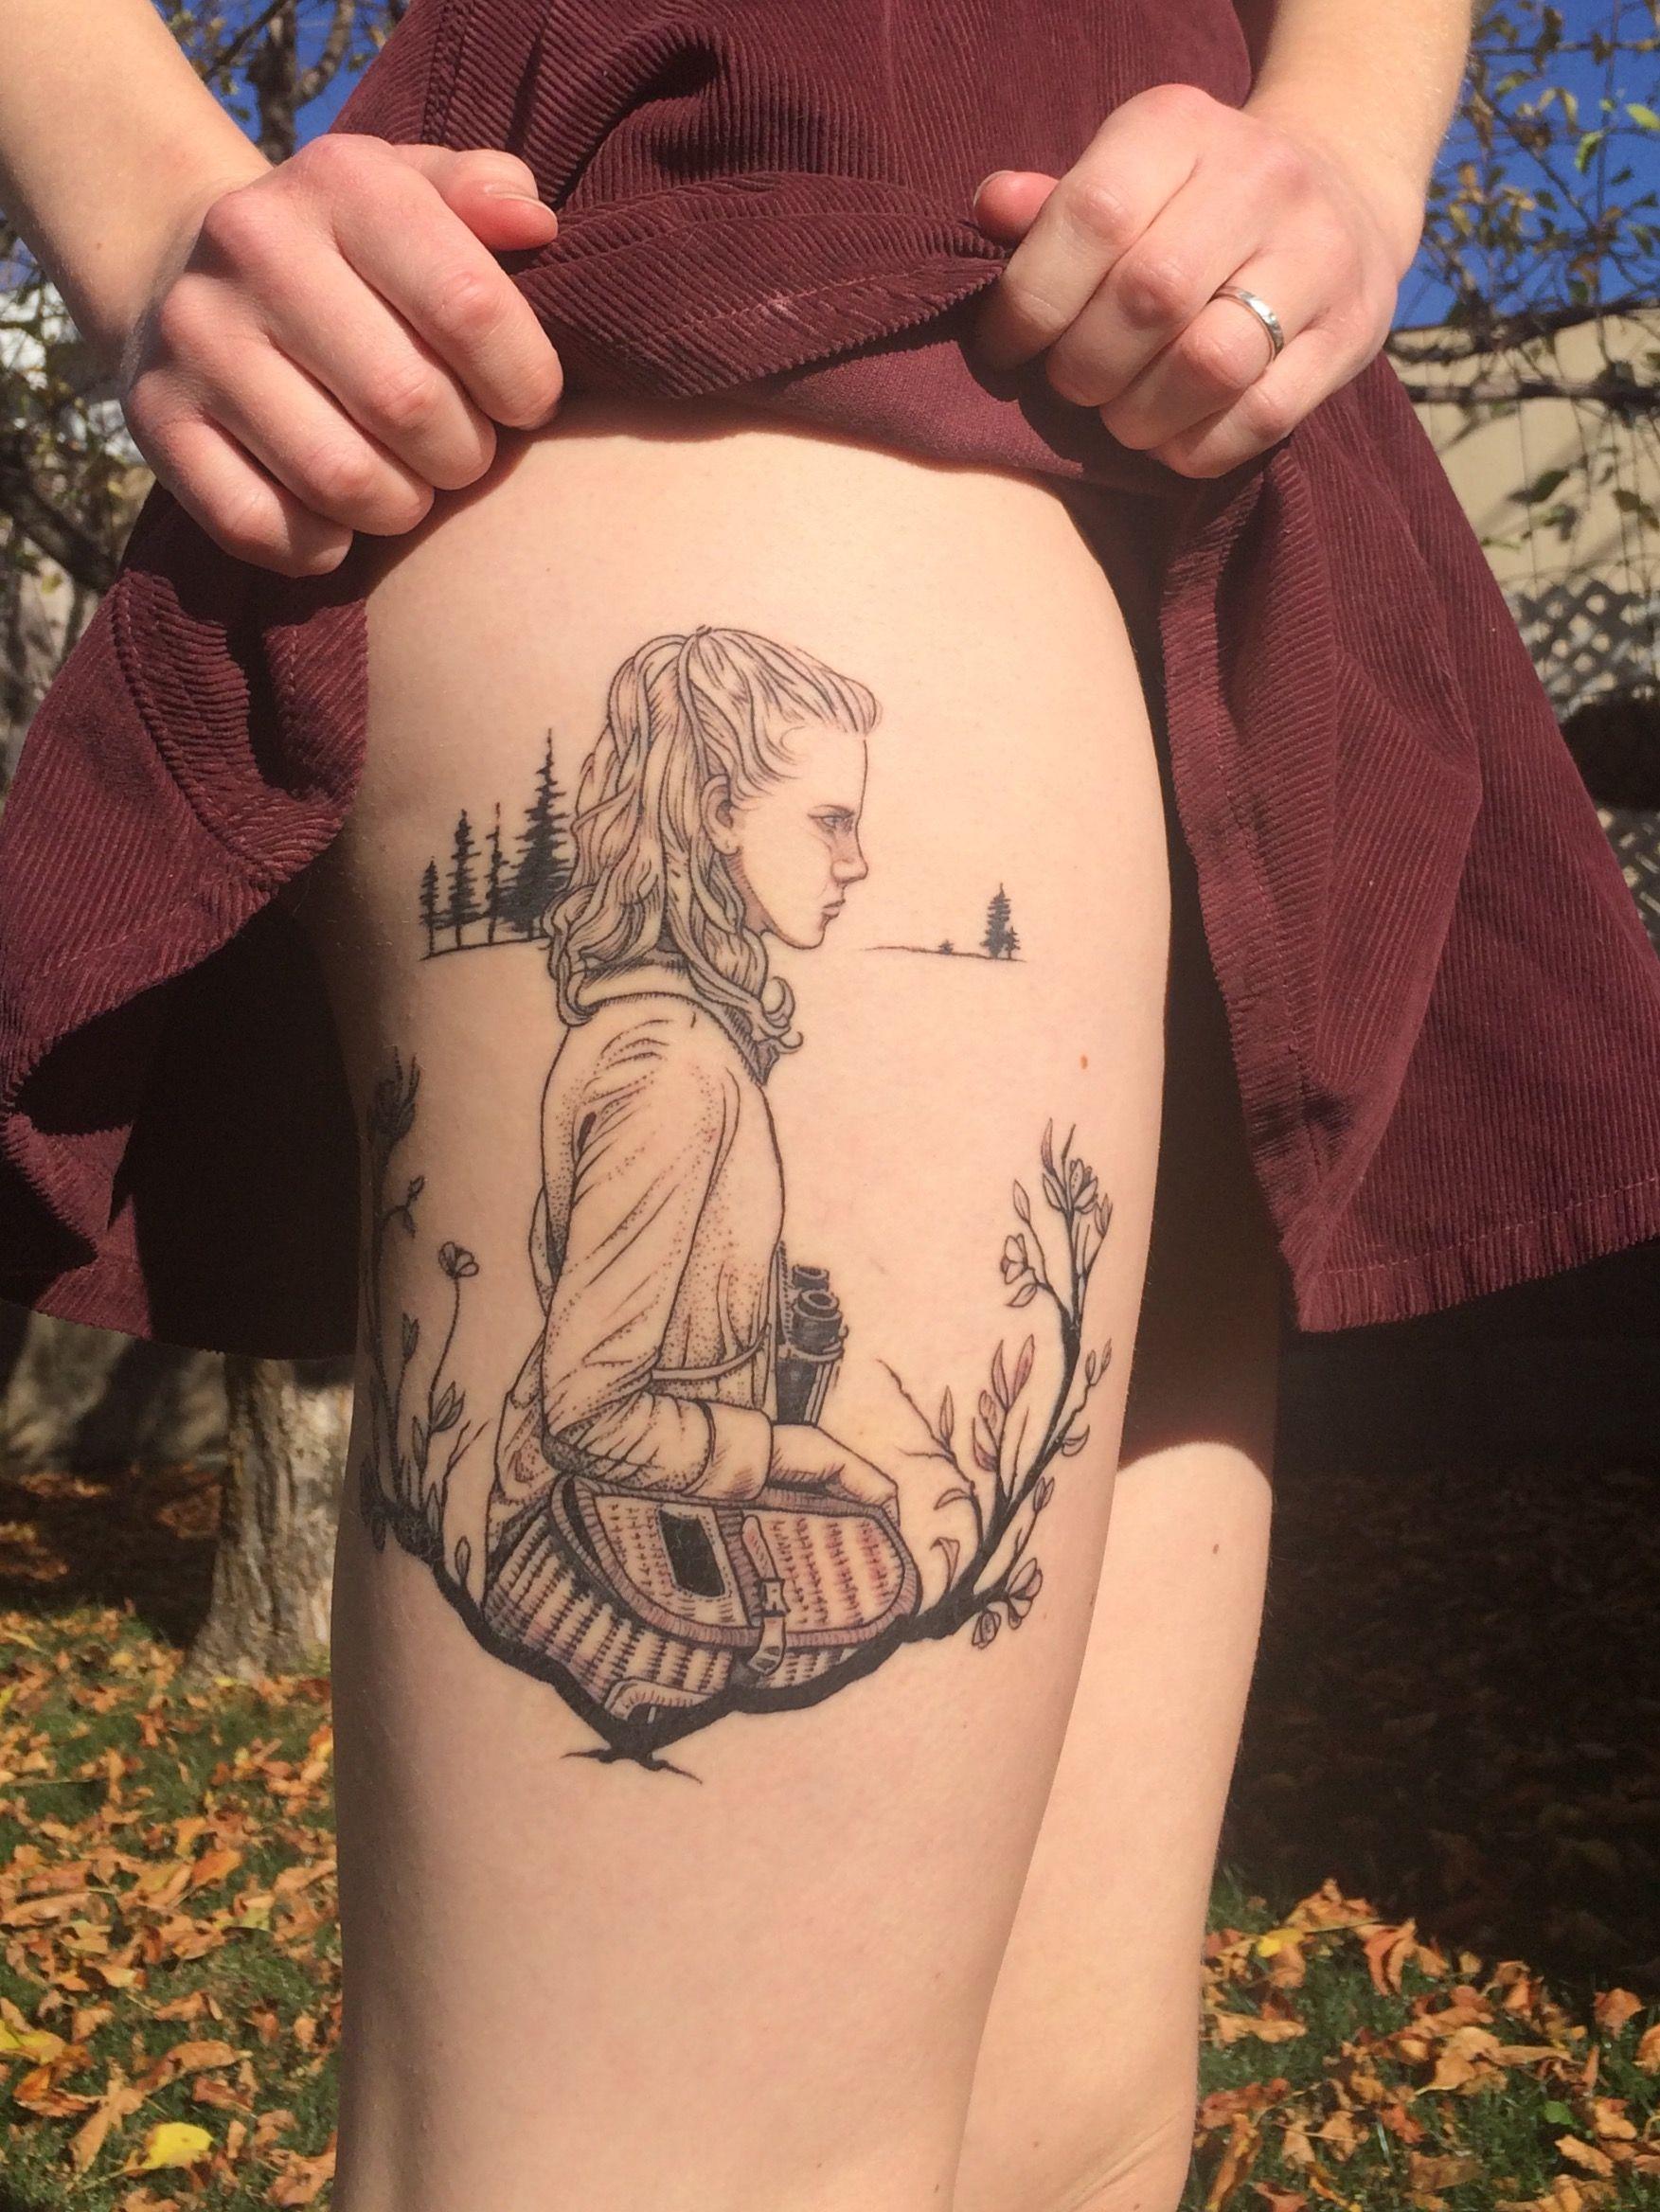 "Suzy from Wes Anderson's ""Moonrise Kingdom"". Done by Annelisa Ochoa @ 27 Tattoo Salt Lake City UT."